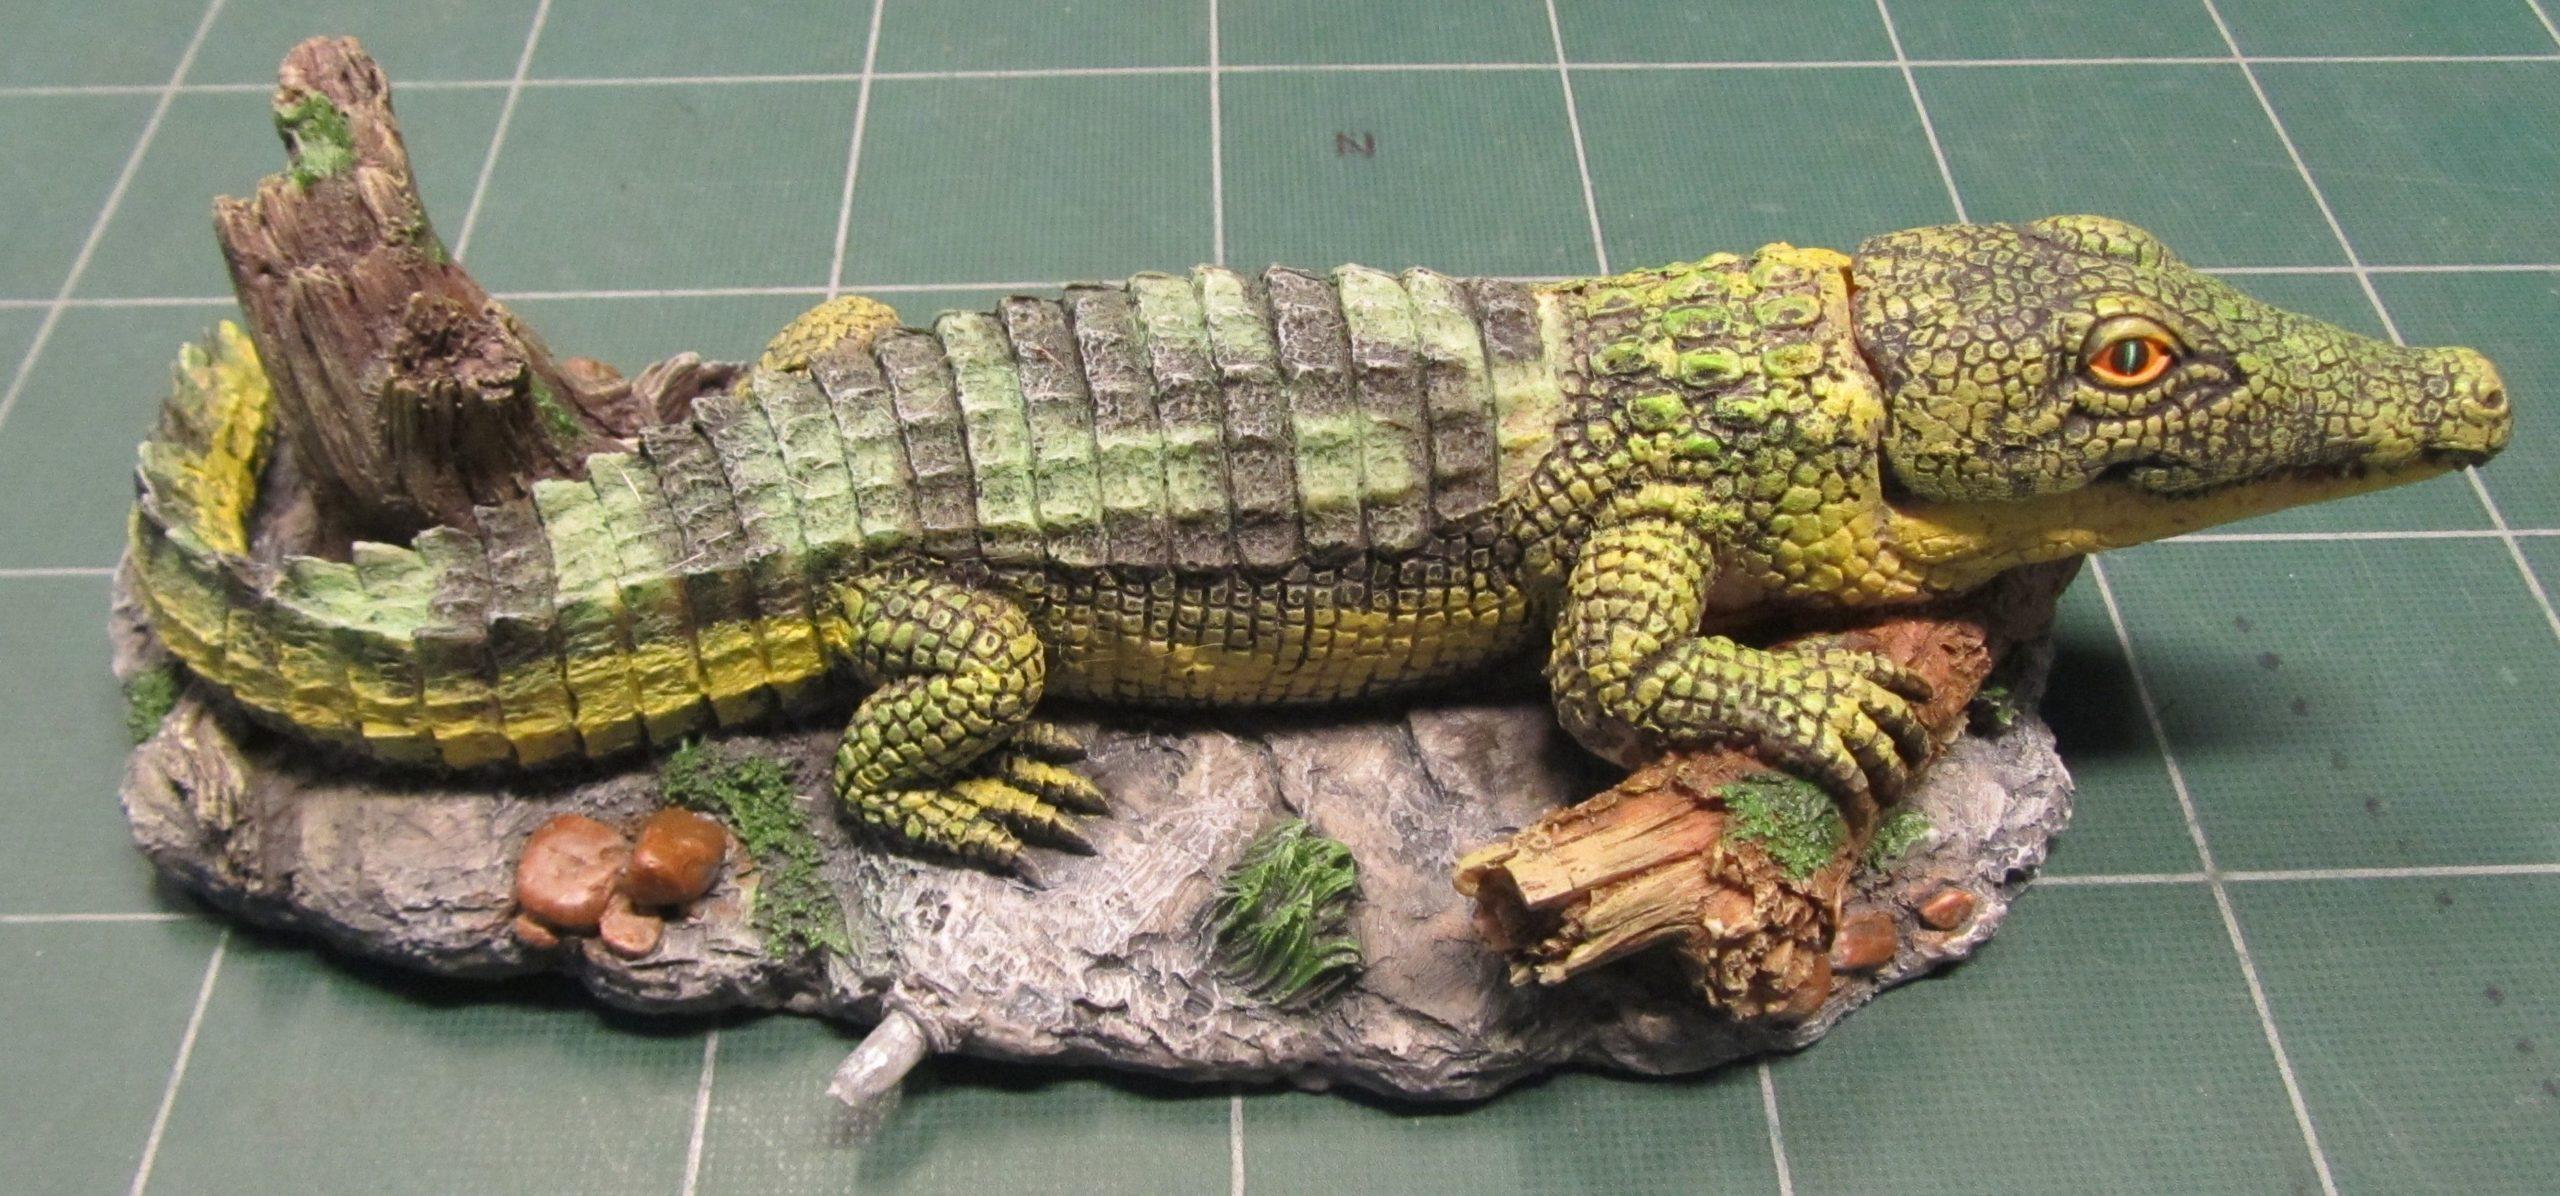 Krokodille til luft.